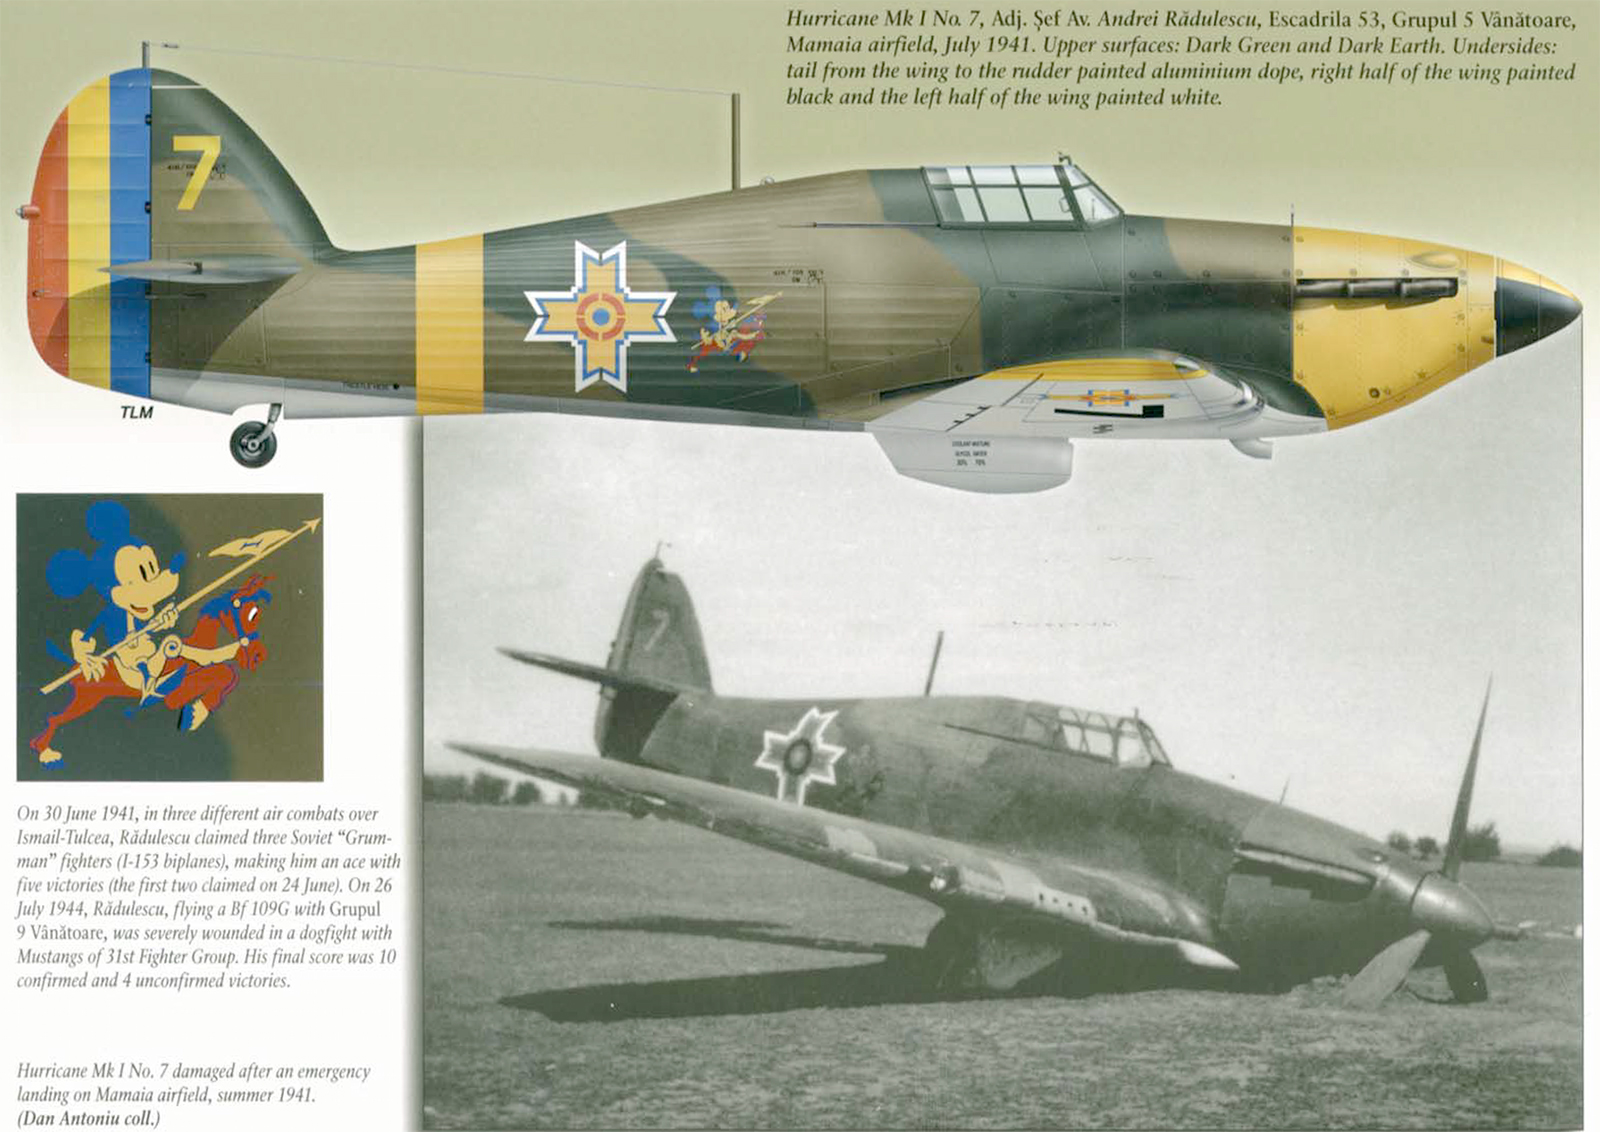 Hawker Hurricane Rumanian AF Esc 5.53 Yellow 7 Horia Agarici Rumania 1941 Mushroom 9111 0A